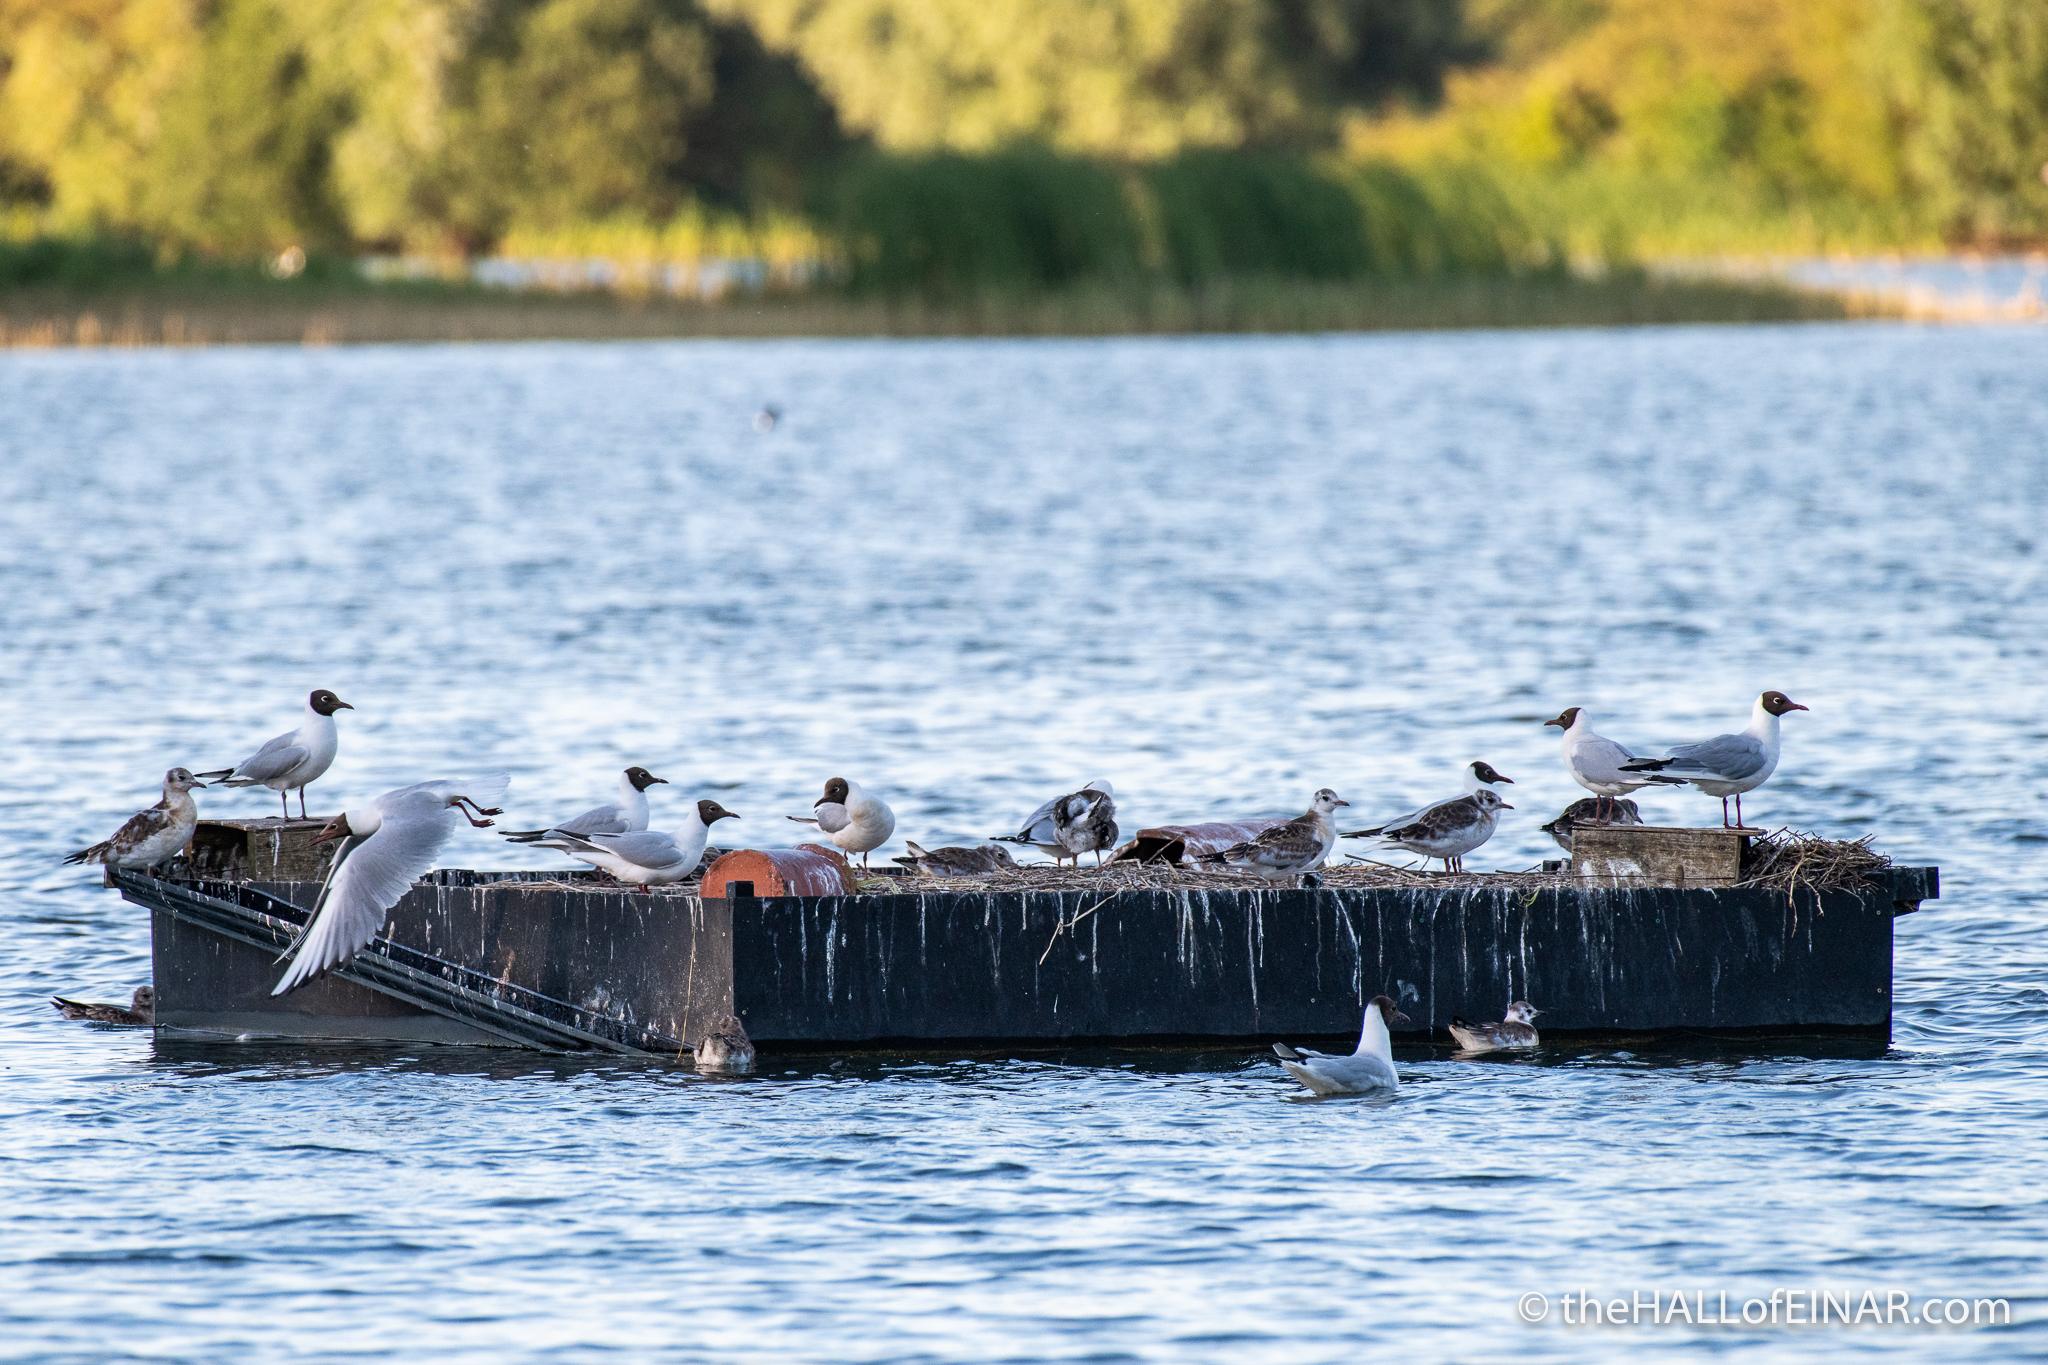 Black Headed Gulls - The Hall of Einar - photograph (c) David Bailey (not the)